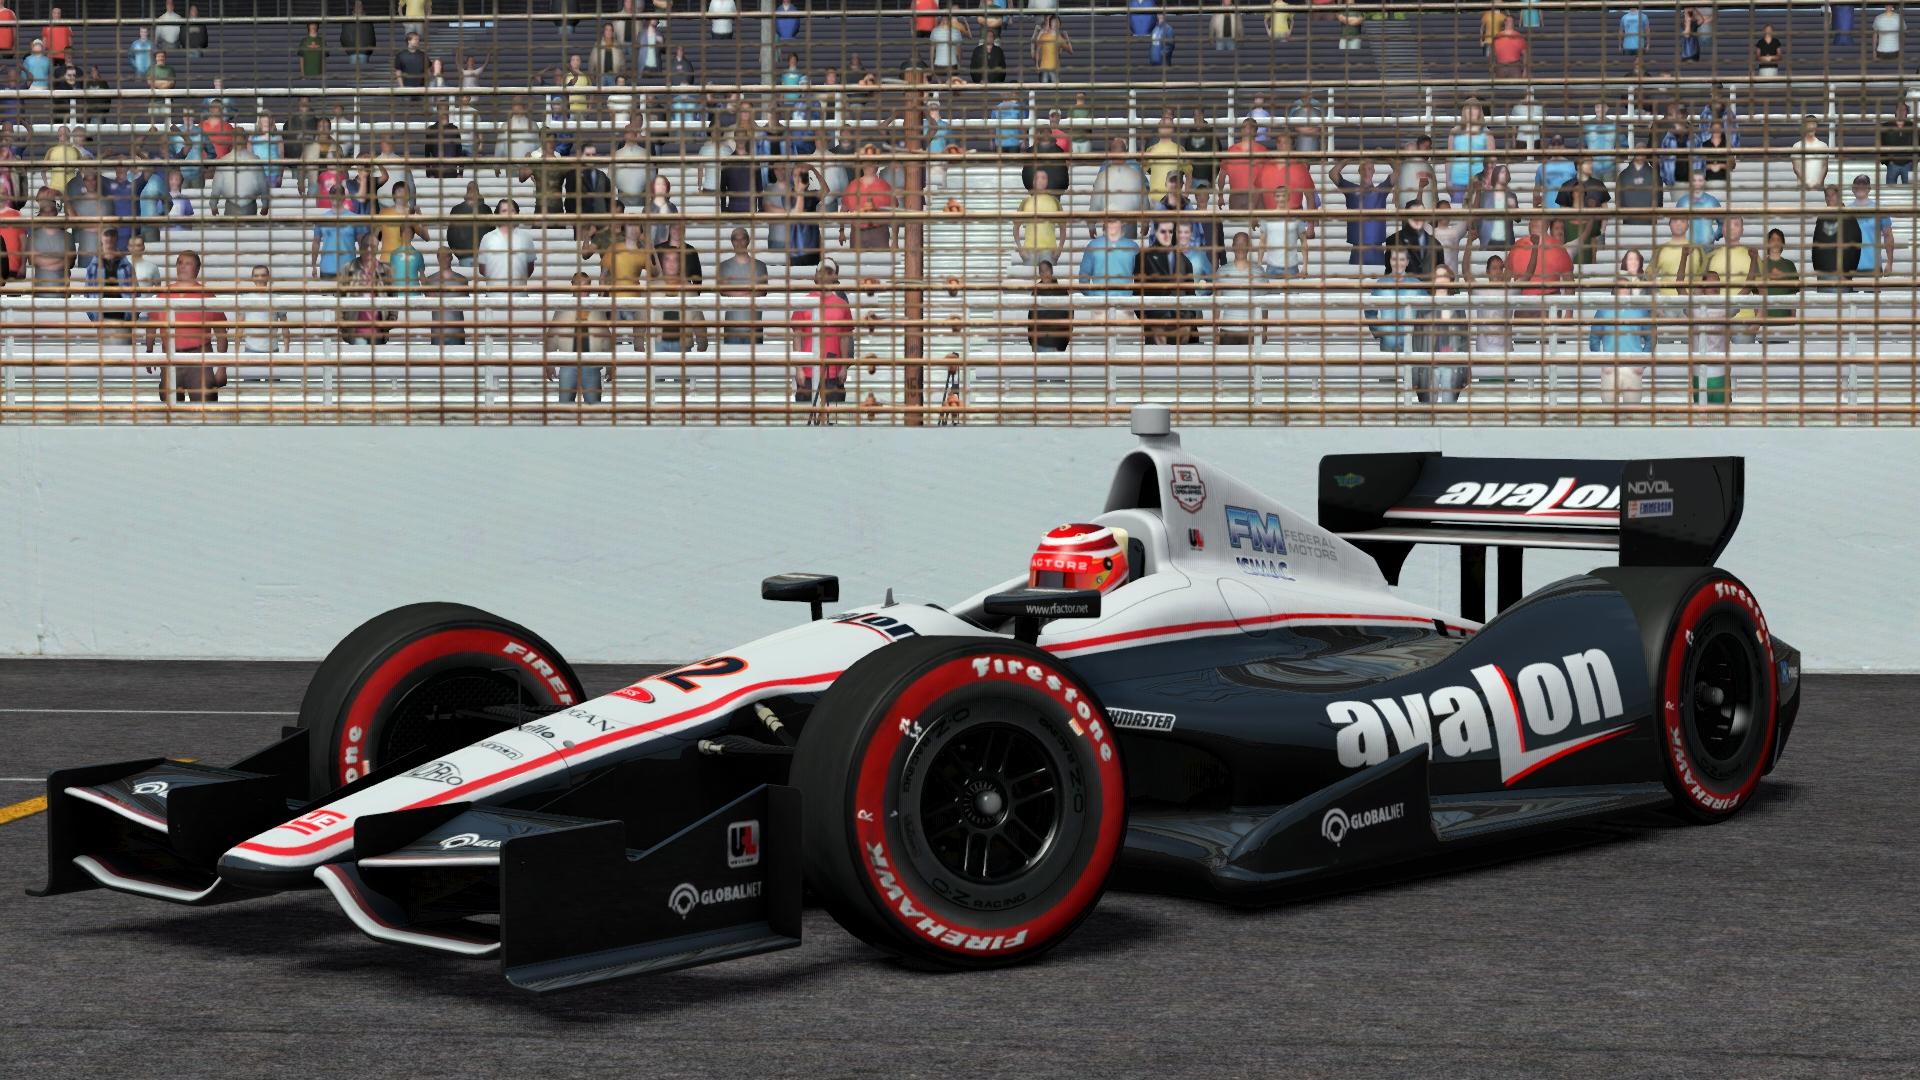 Dallara DW12 Indy car @ Indianapolis Motor Speedway